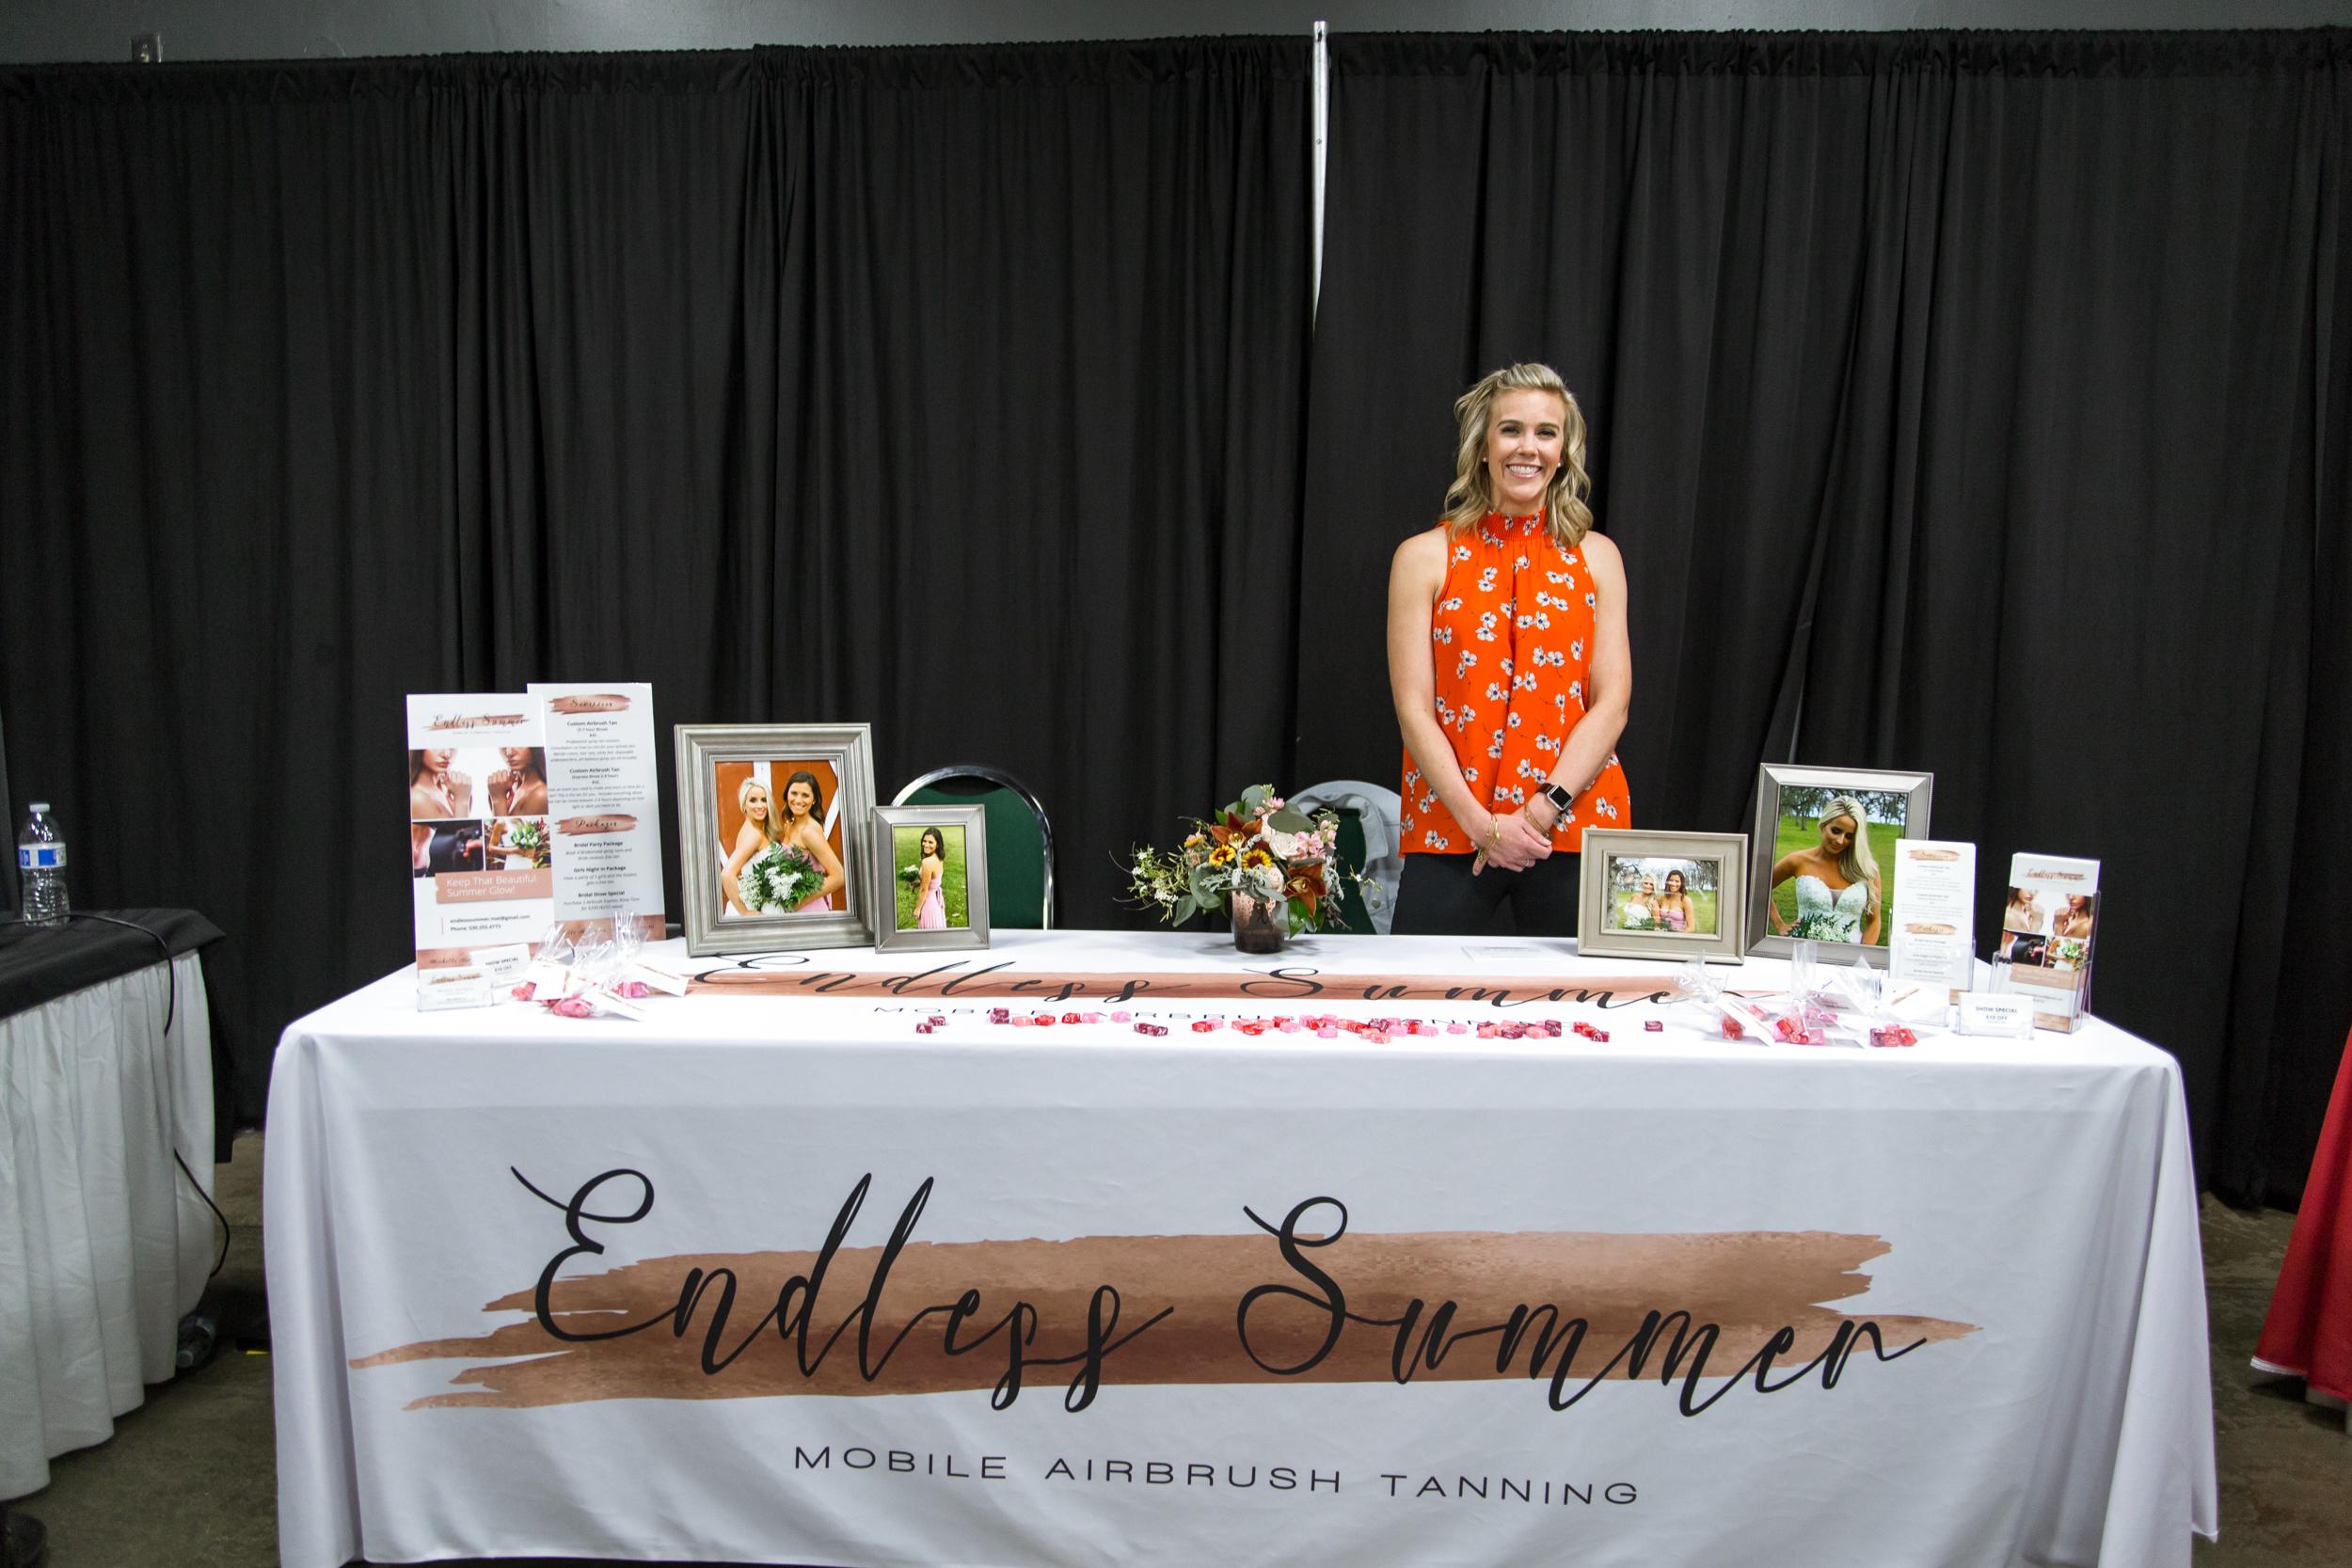 Endless Summer Tanning Redding Bridal Show Wedding Expo